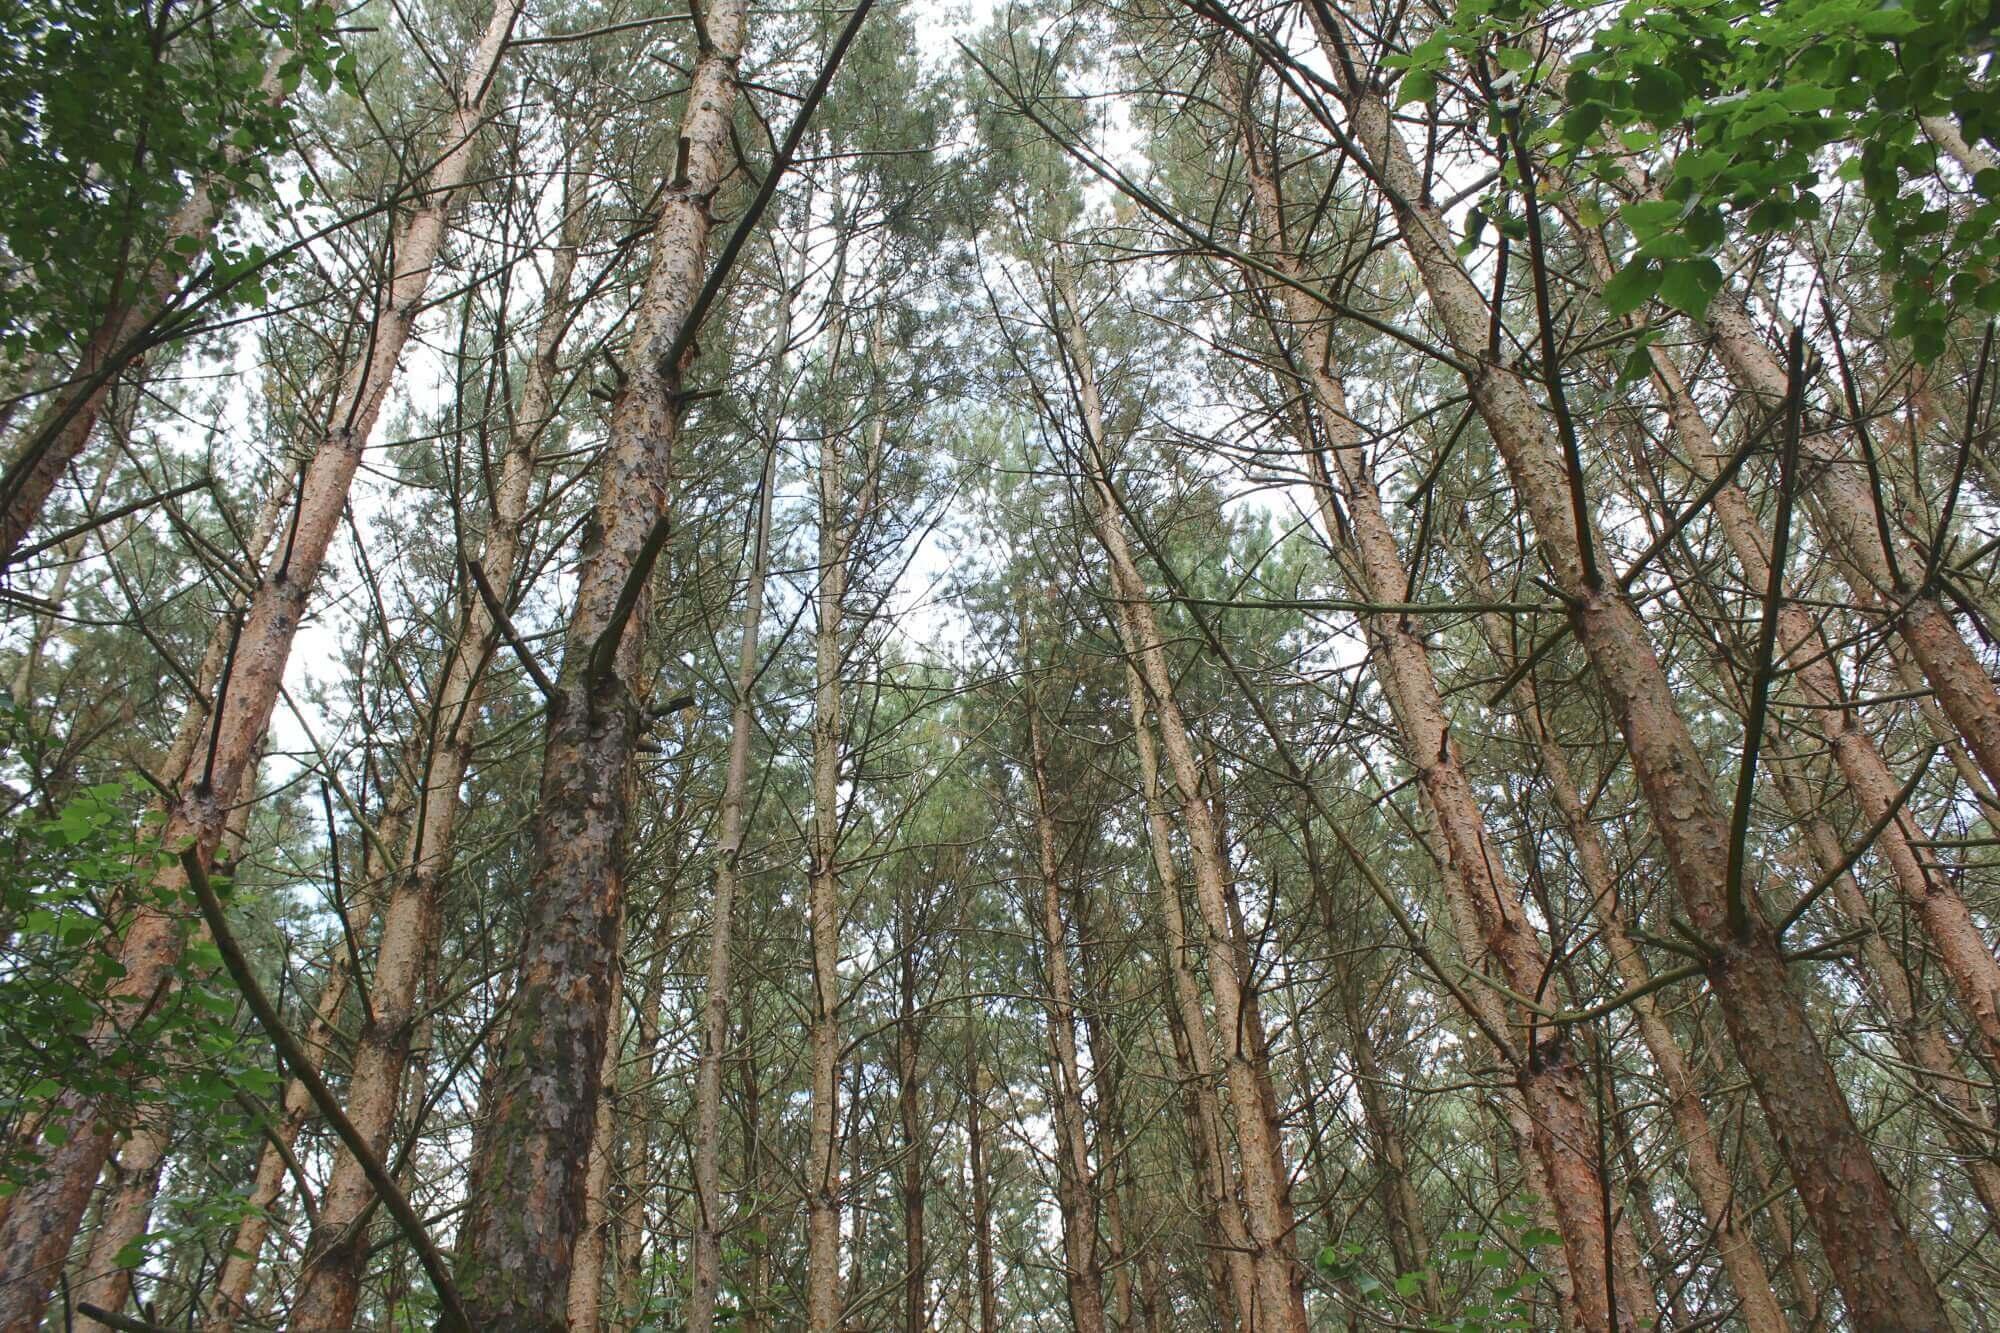 Baumlabyrint am Feensteig im Nationalpark Hainich